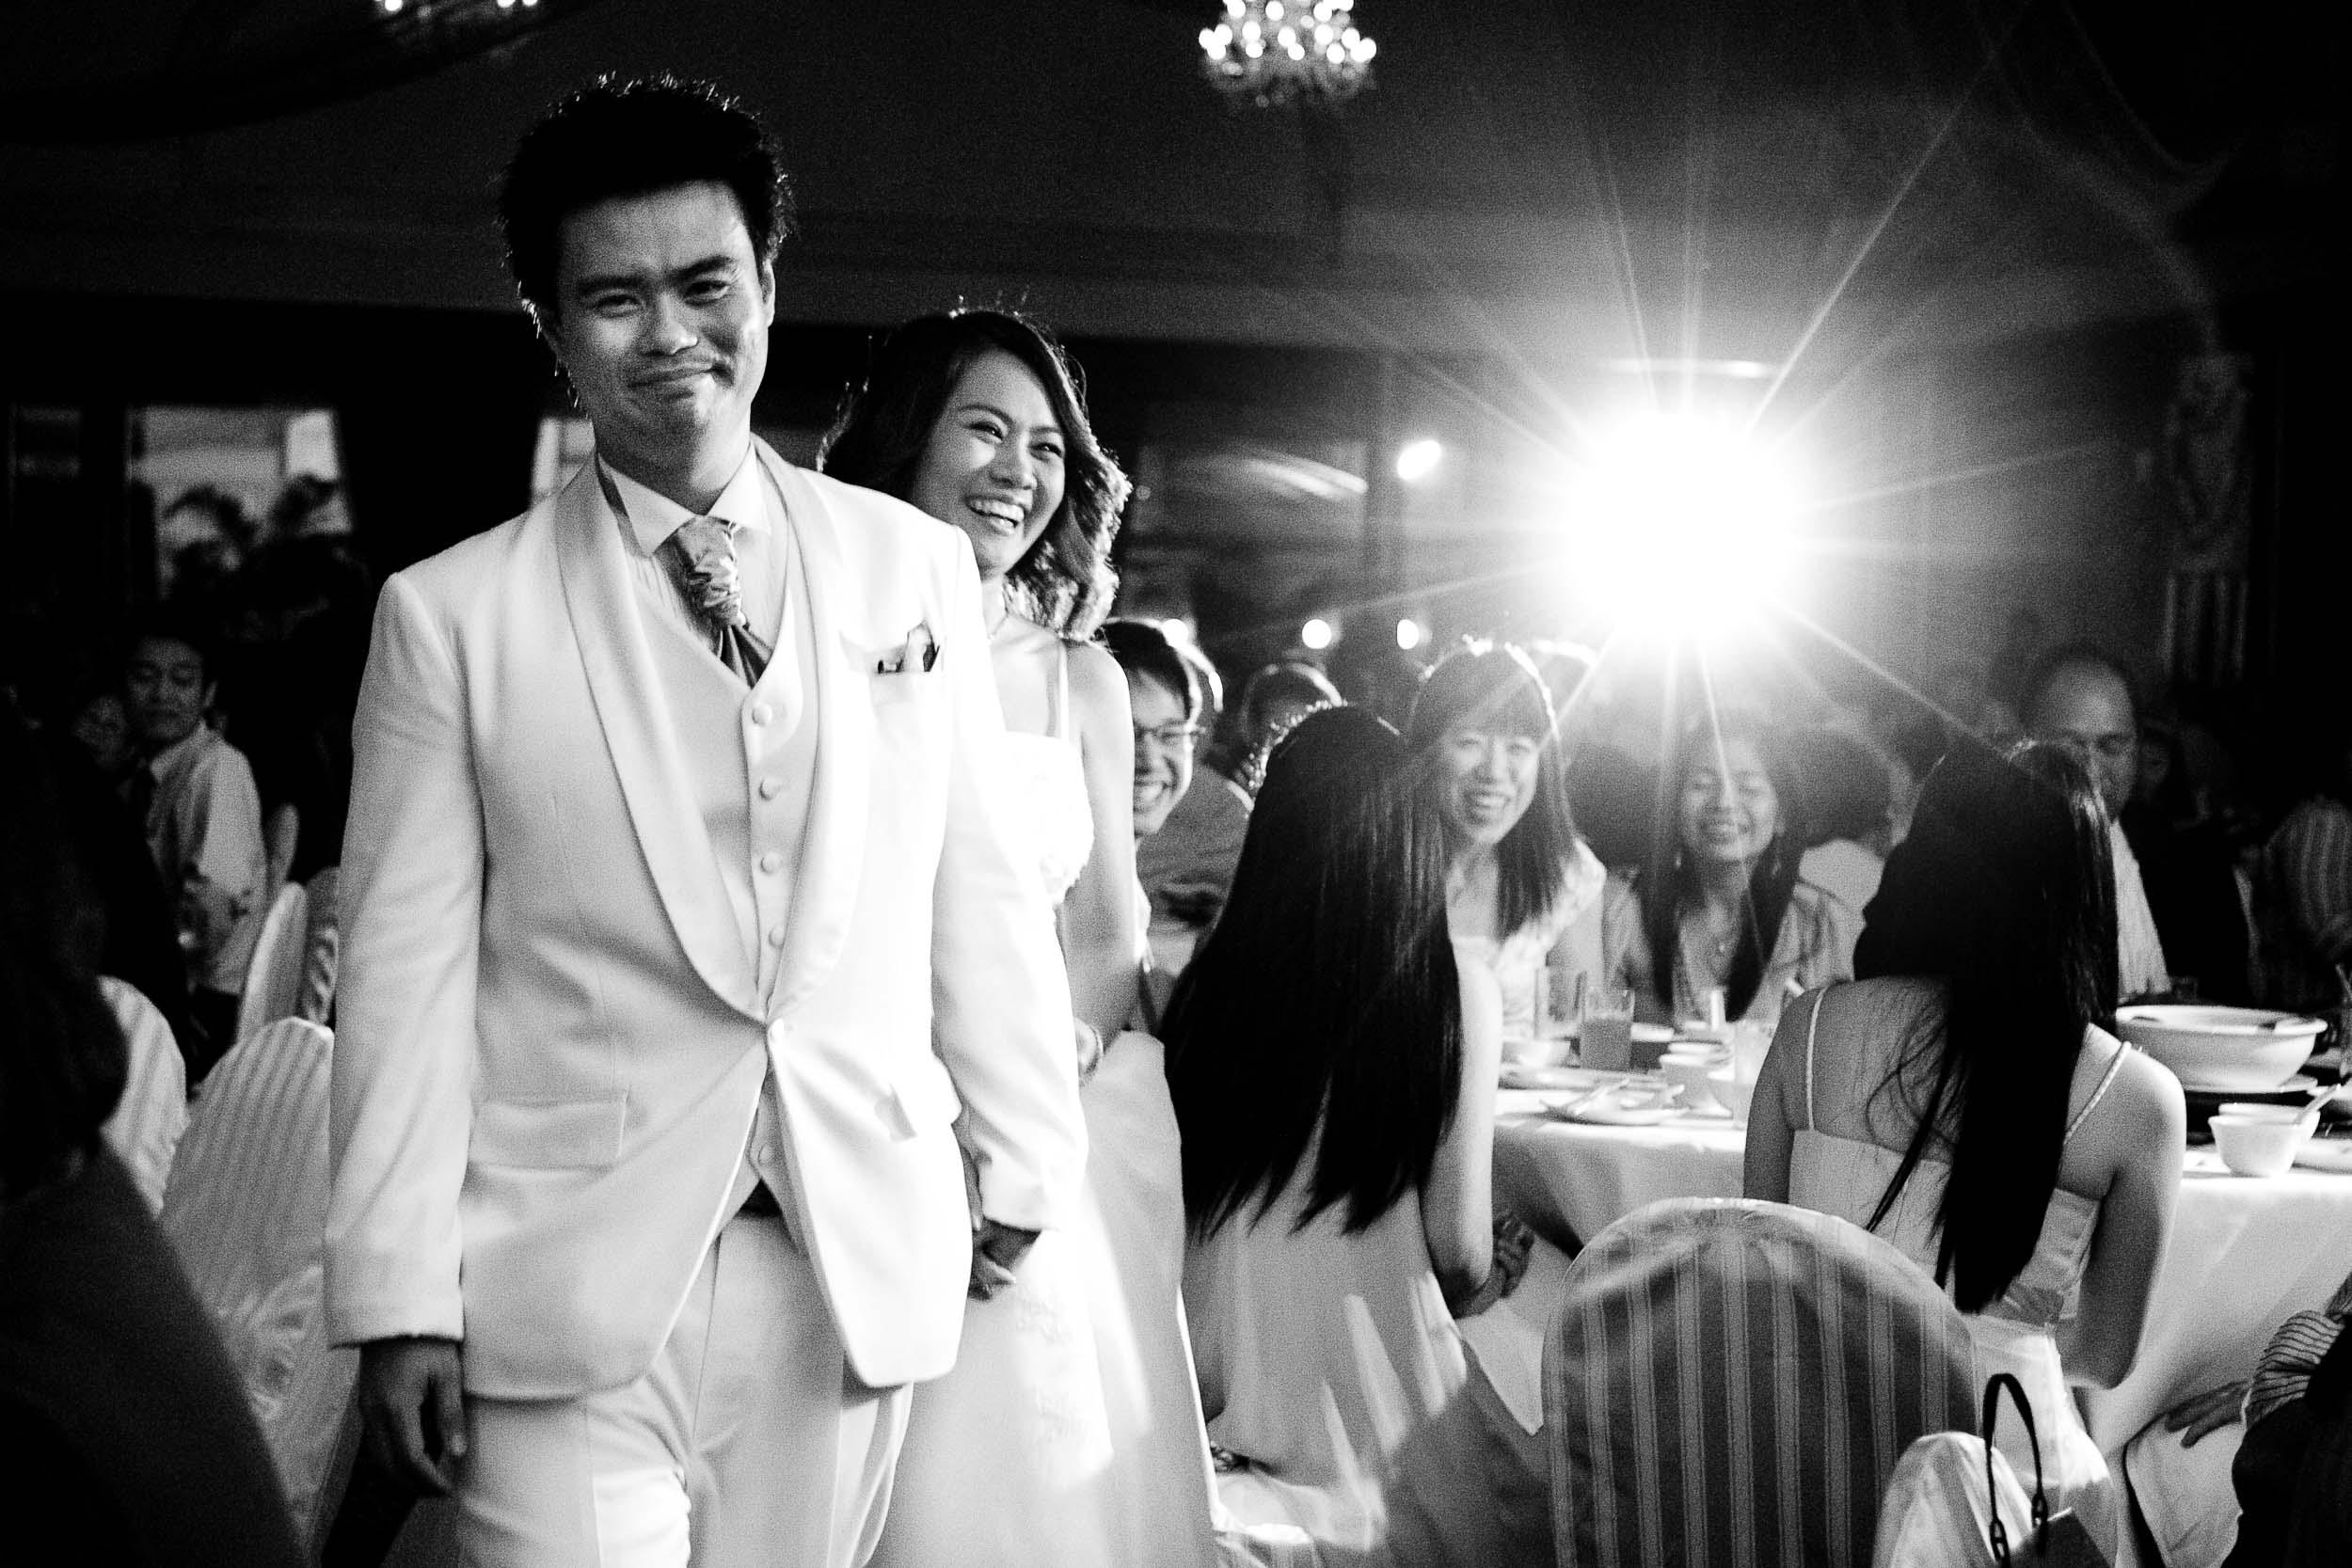 Chaophya Park Hotel Wedding งานแต่ง ที่ โรงแรมเจ้าพระยาปาร์ค